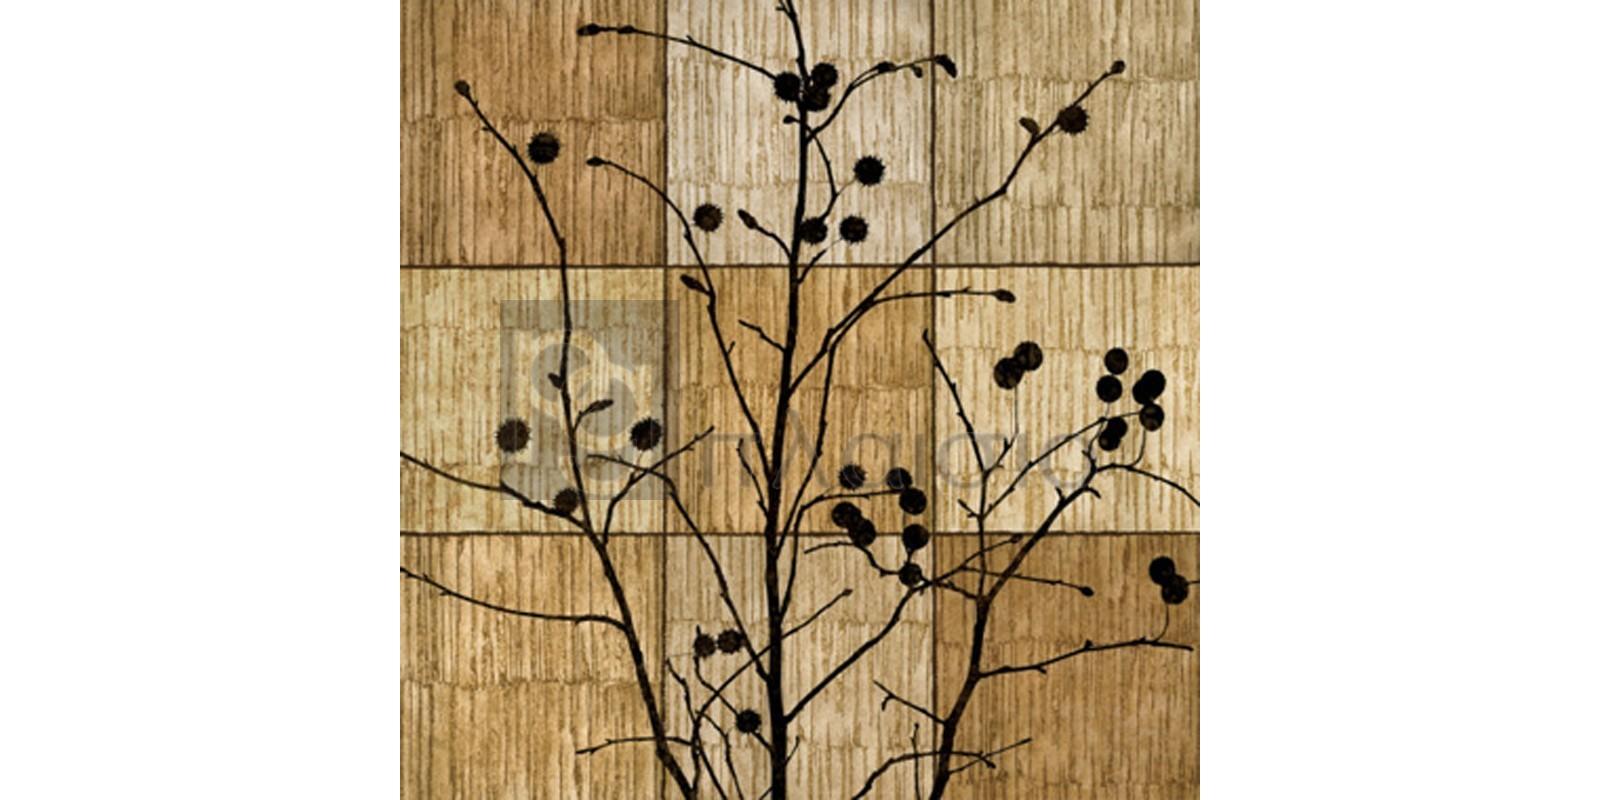 Chris Donovan - Tree Silhouette I